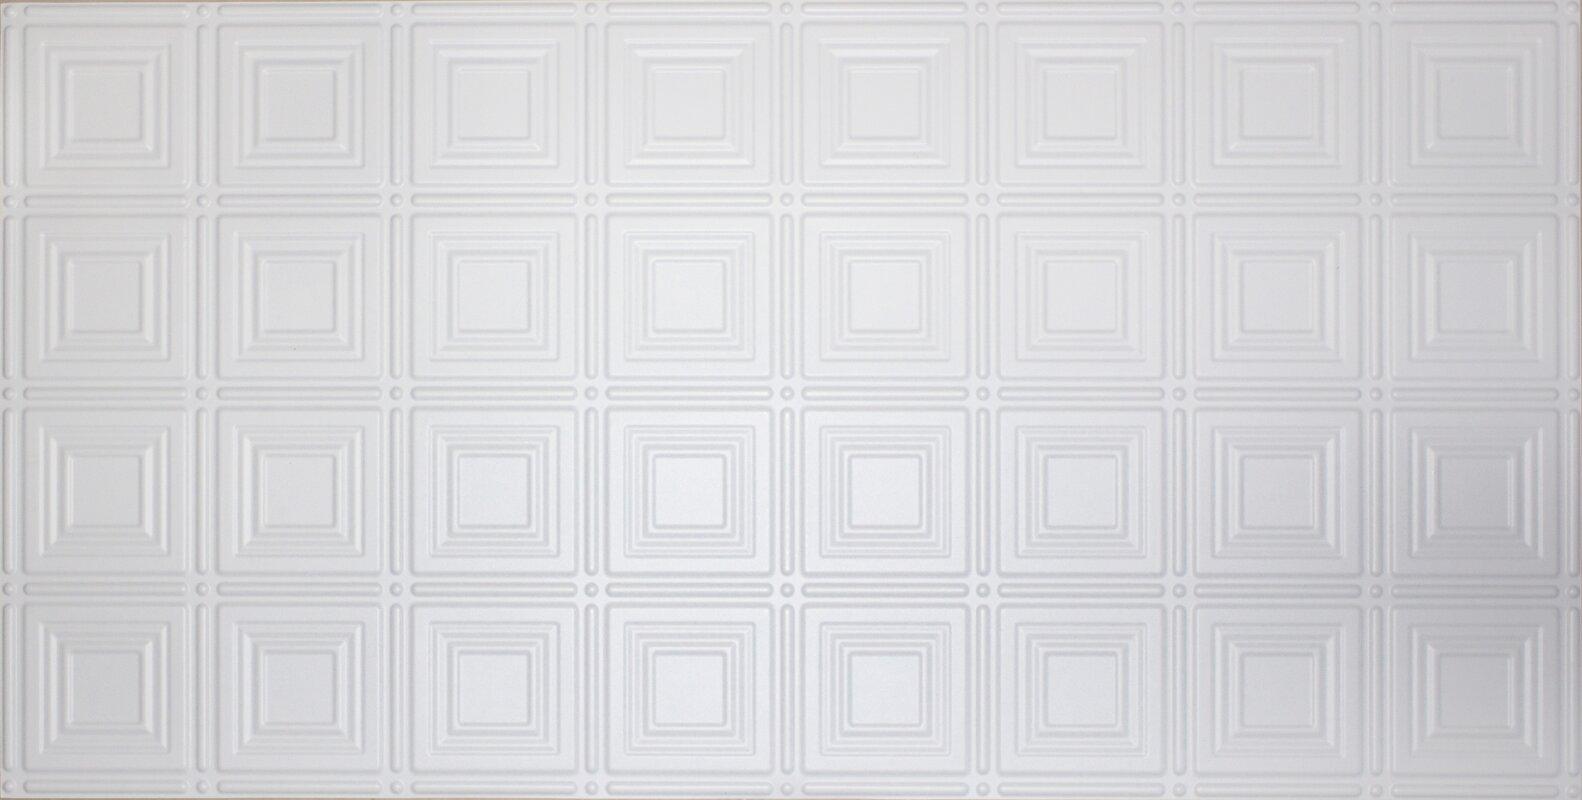 Ceiling tiles glue up